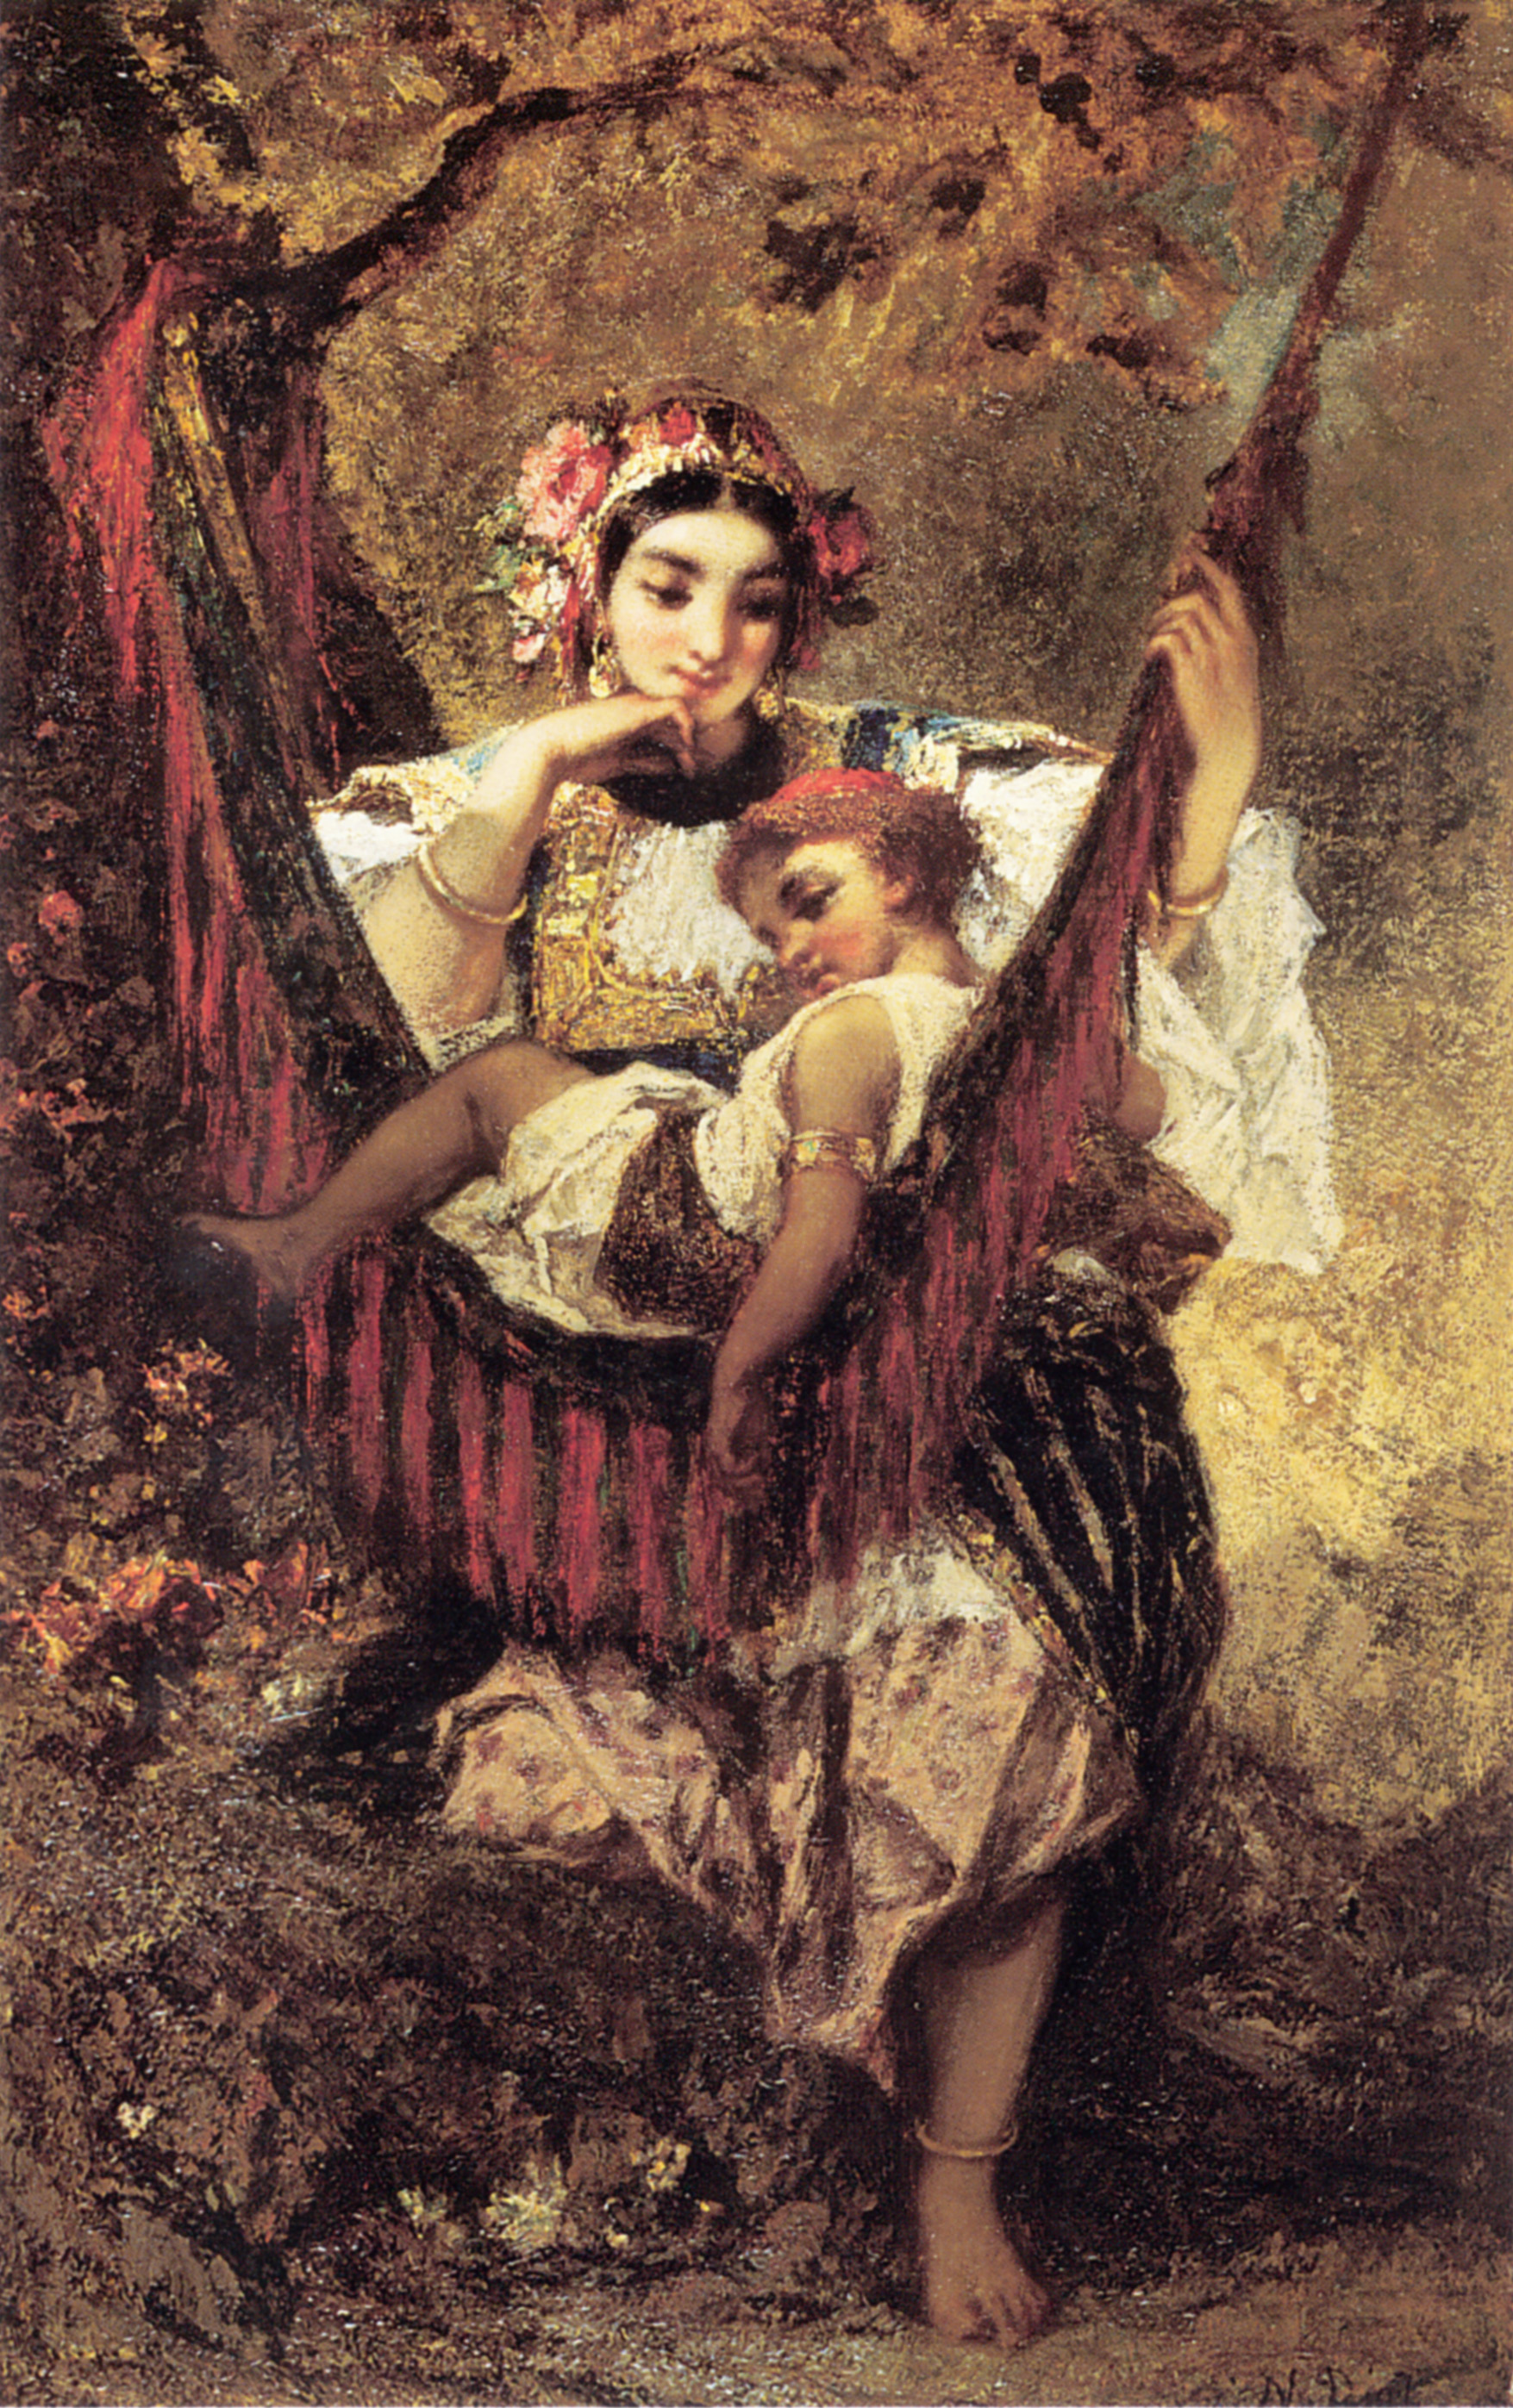 Mother and Child :: Narcisse-Virgile Dнaz de la Peсa - Woman and child in painting and art ôîòî